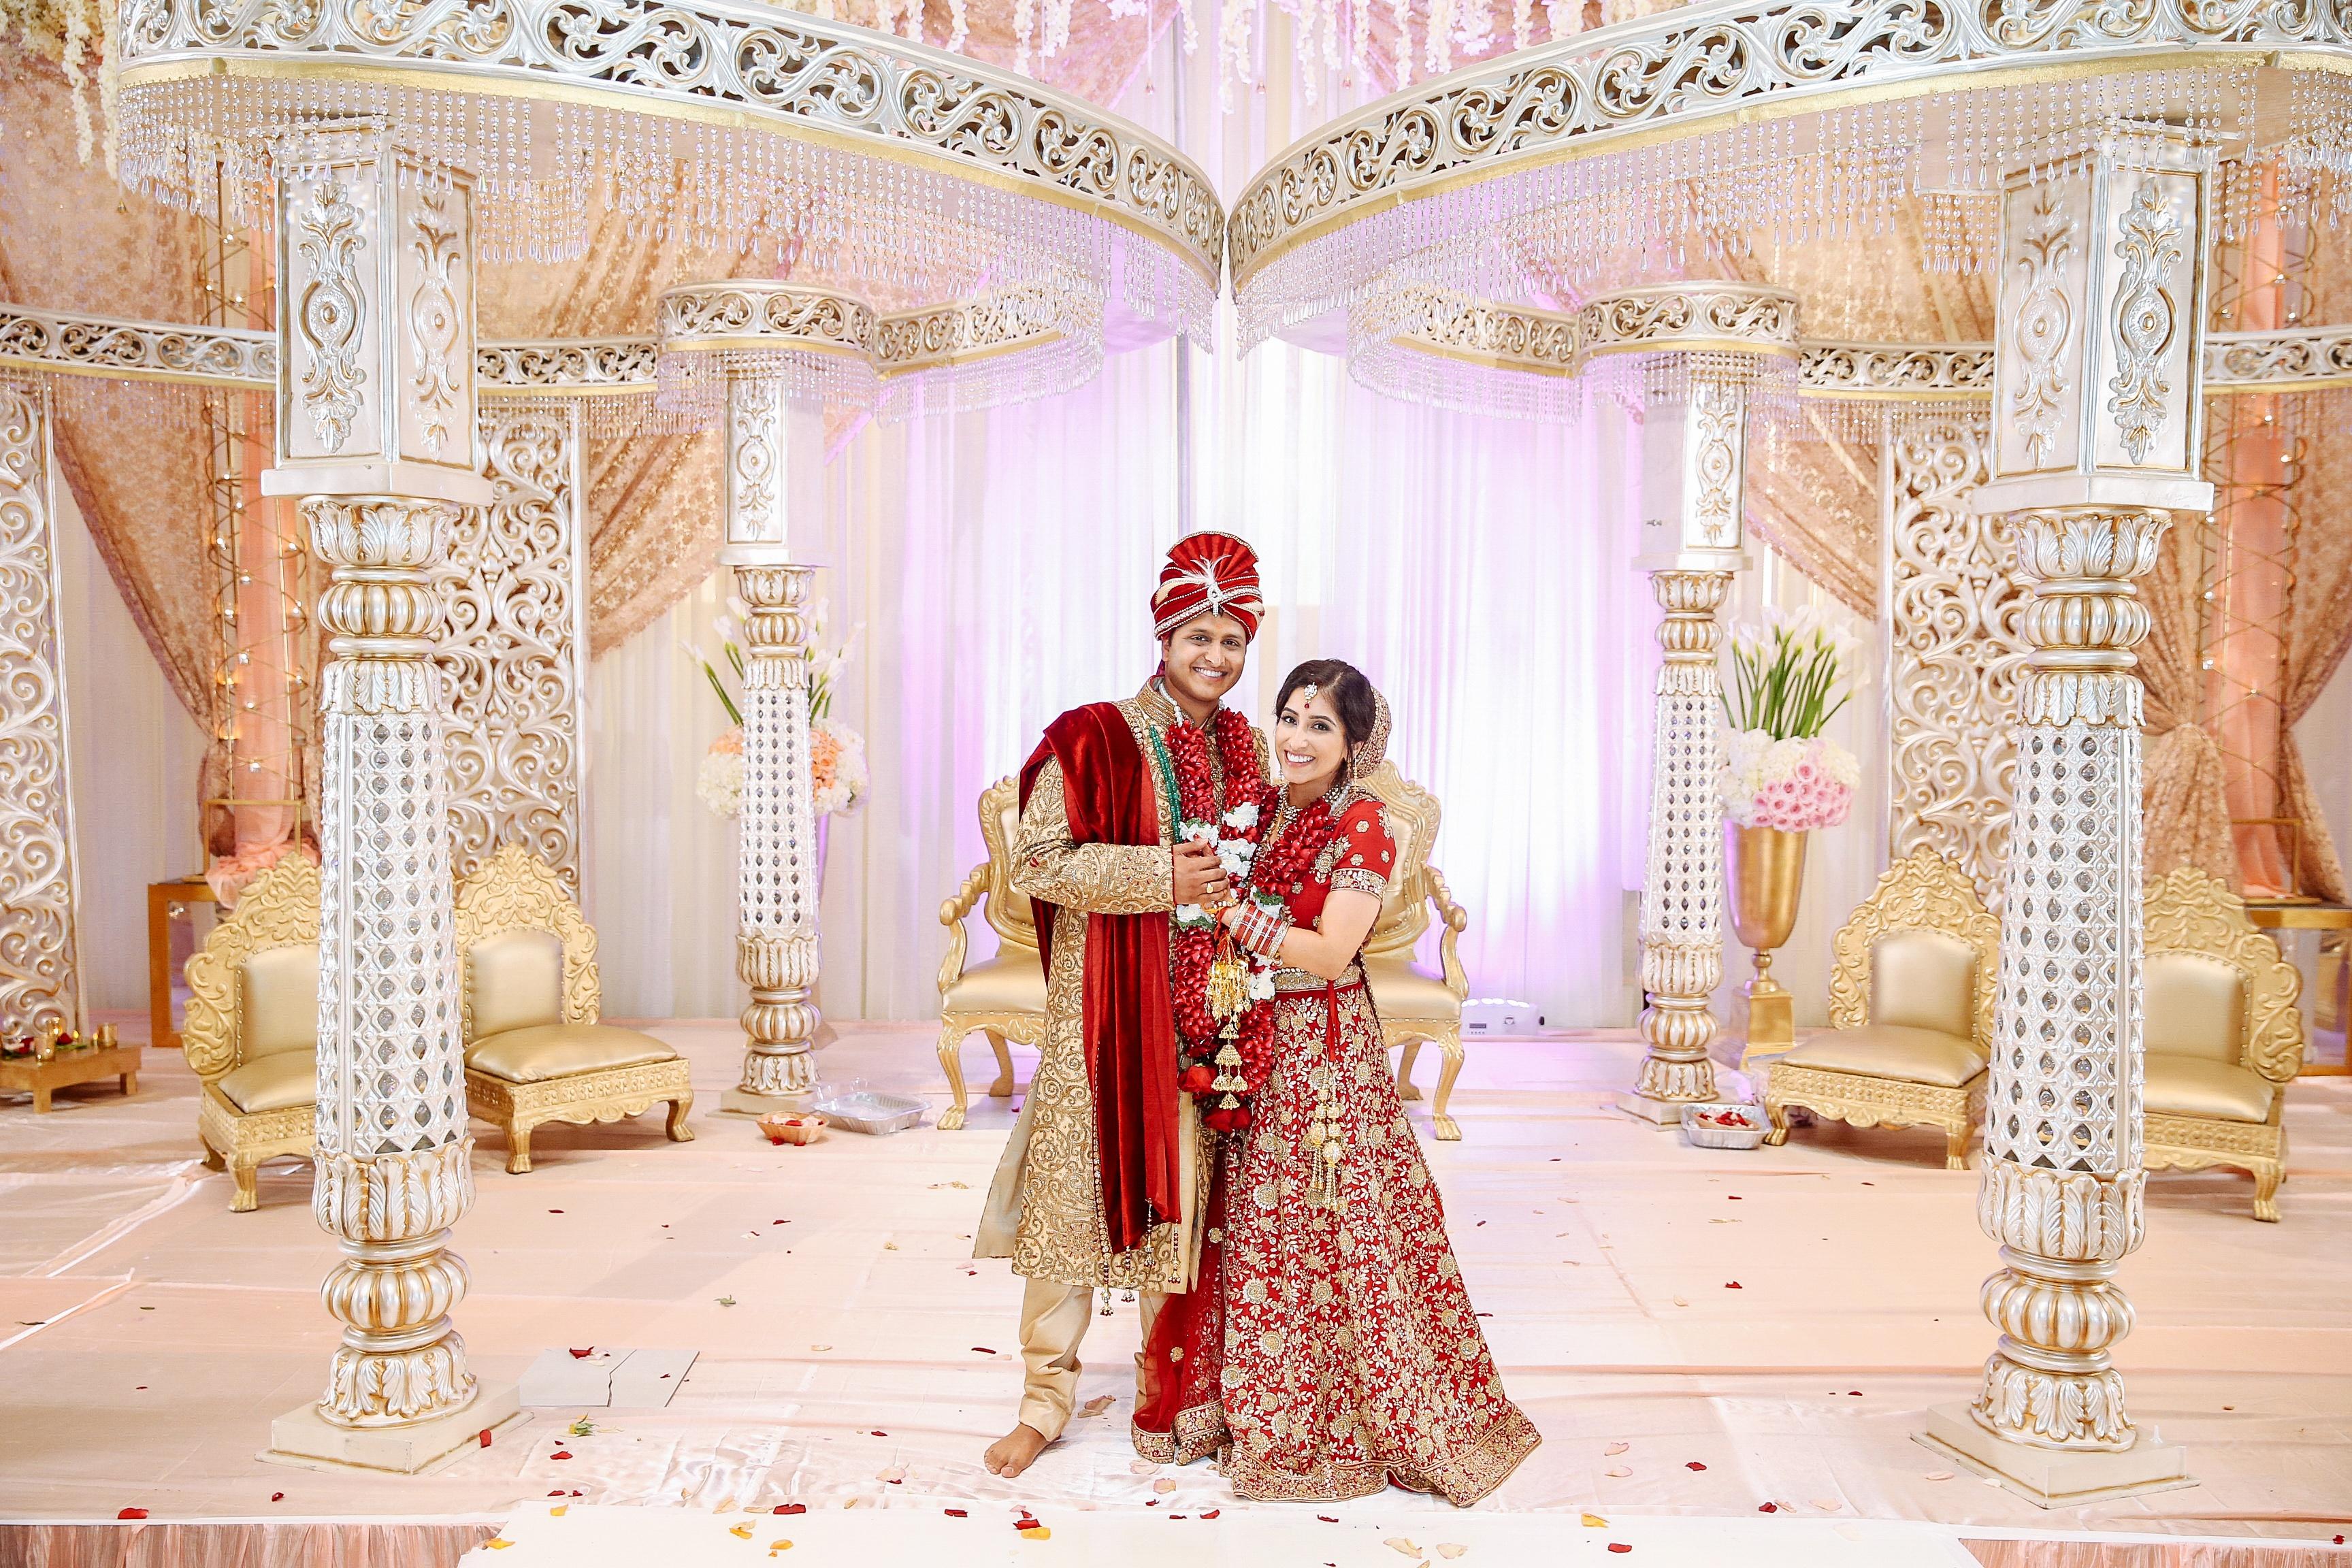 VEK Photo - Indian Wedding Photographer Dallas